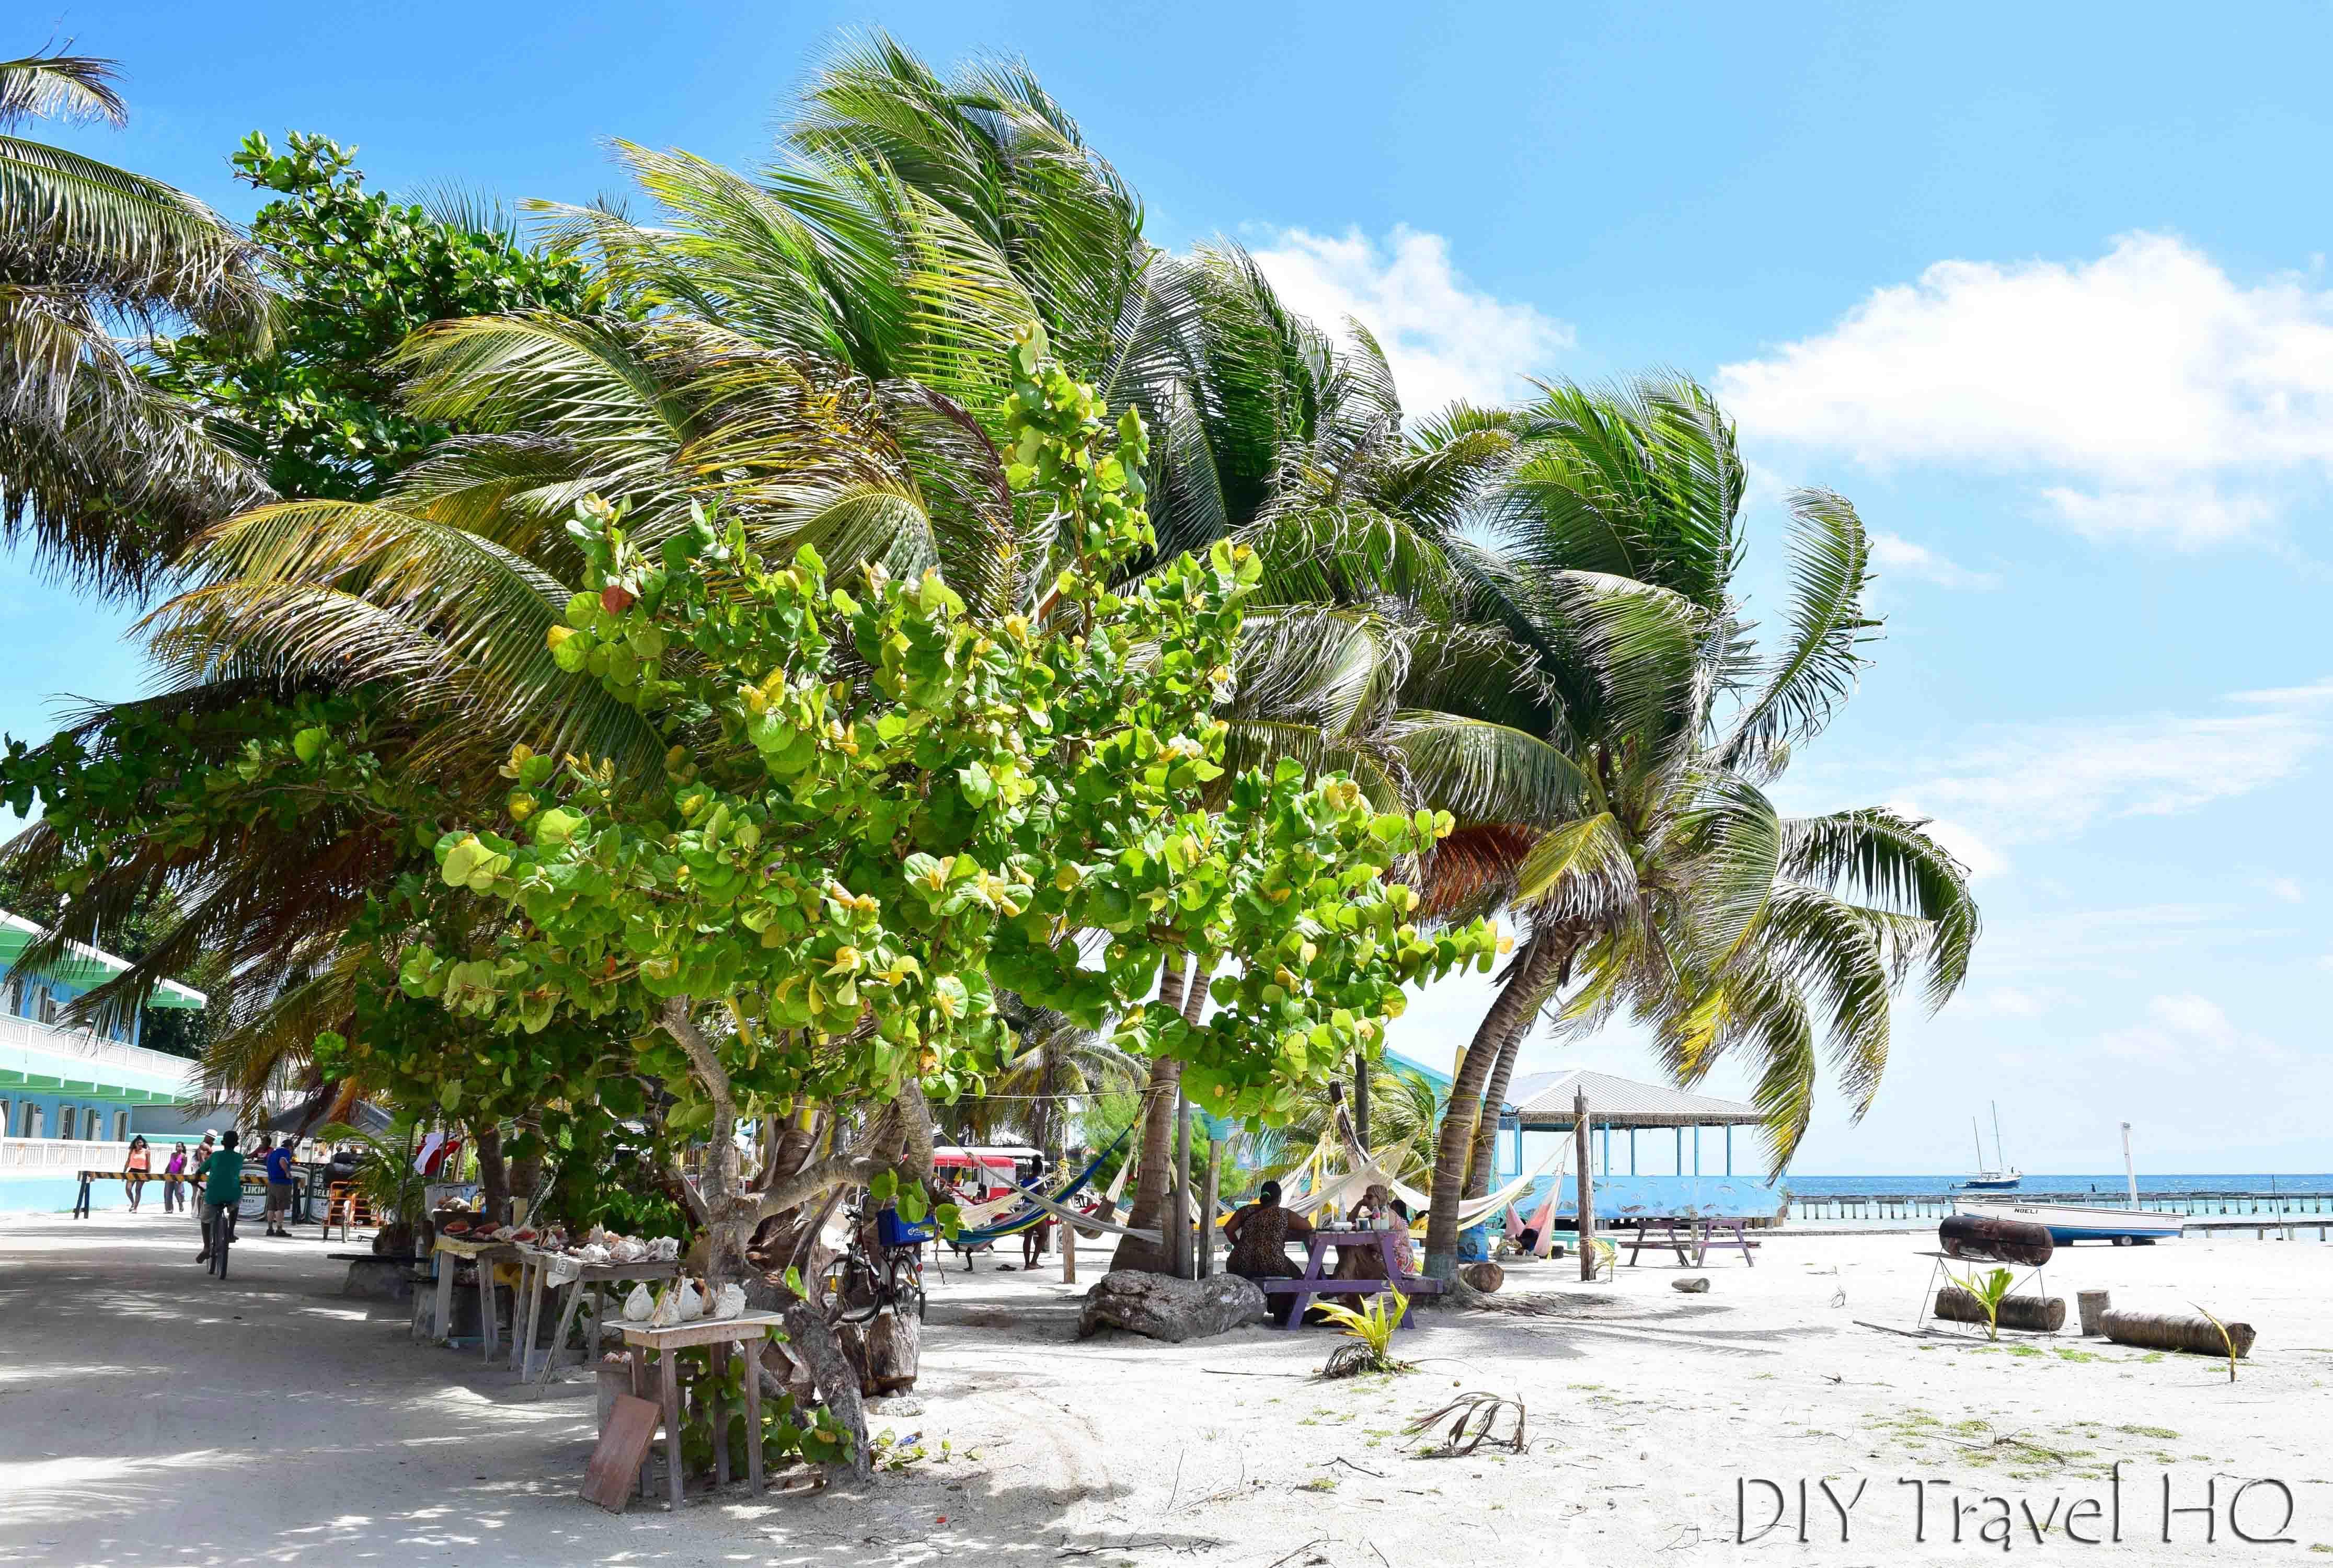 Caye Caulker Travel Guide: Budget Island Paradise! - DIY Travel HQ